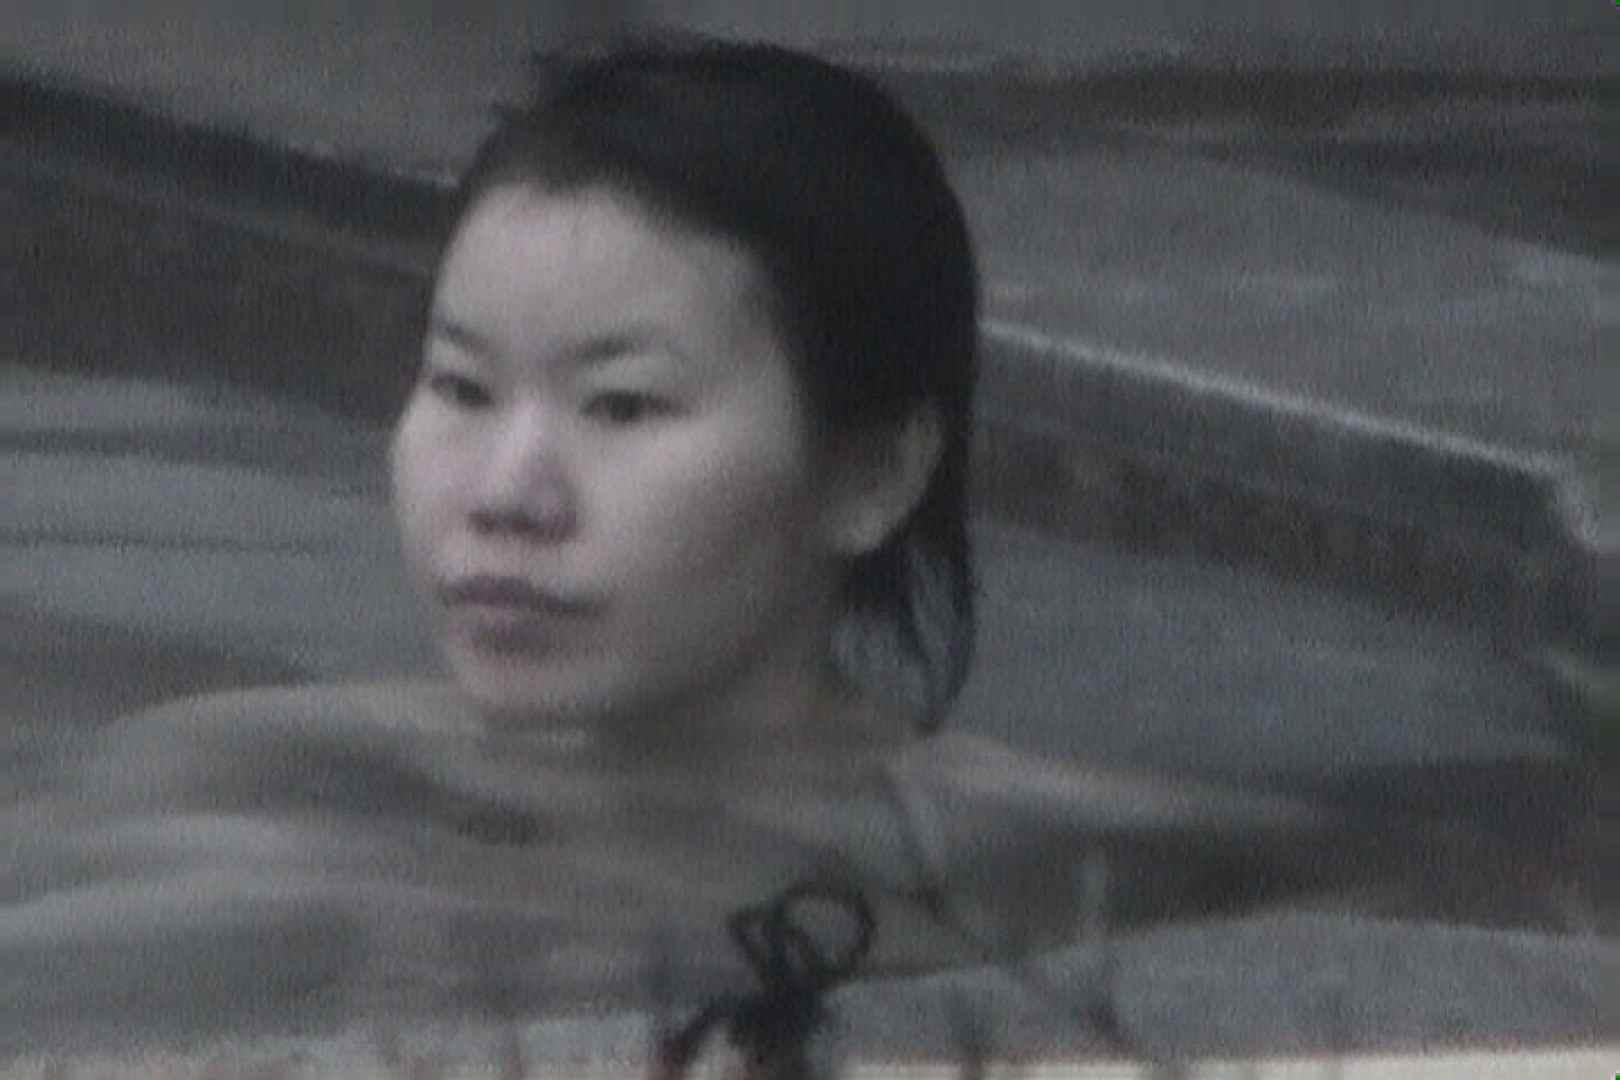 Aquaな露天風呂Vol.556 露天風呂編 | 盗撮シリーズ  99PIX 95